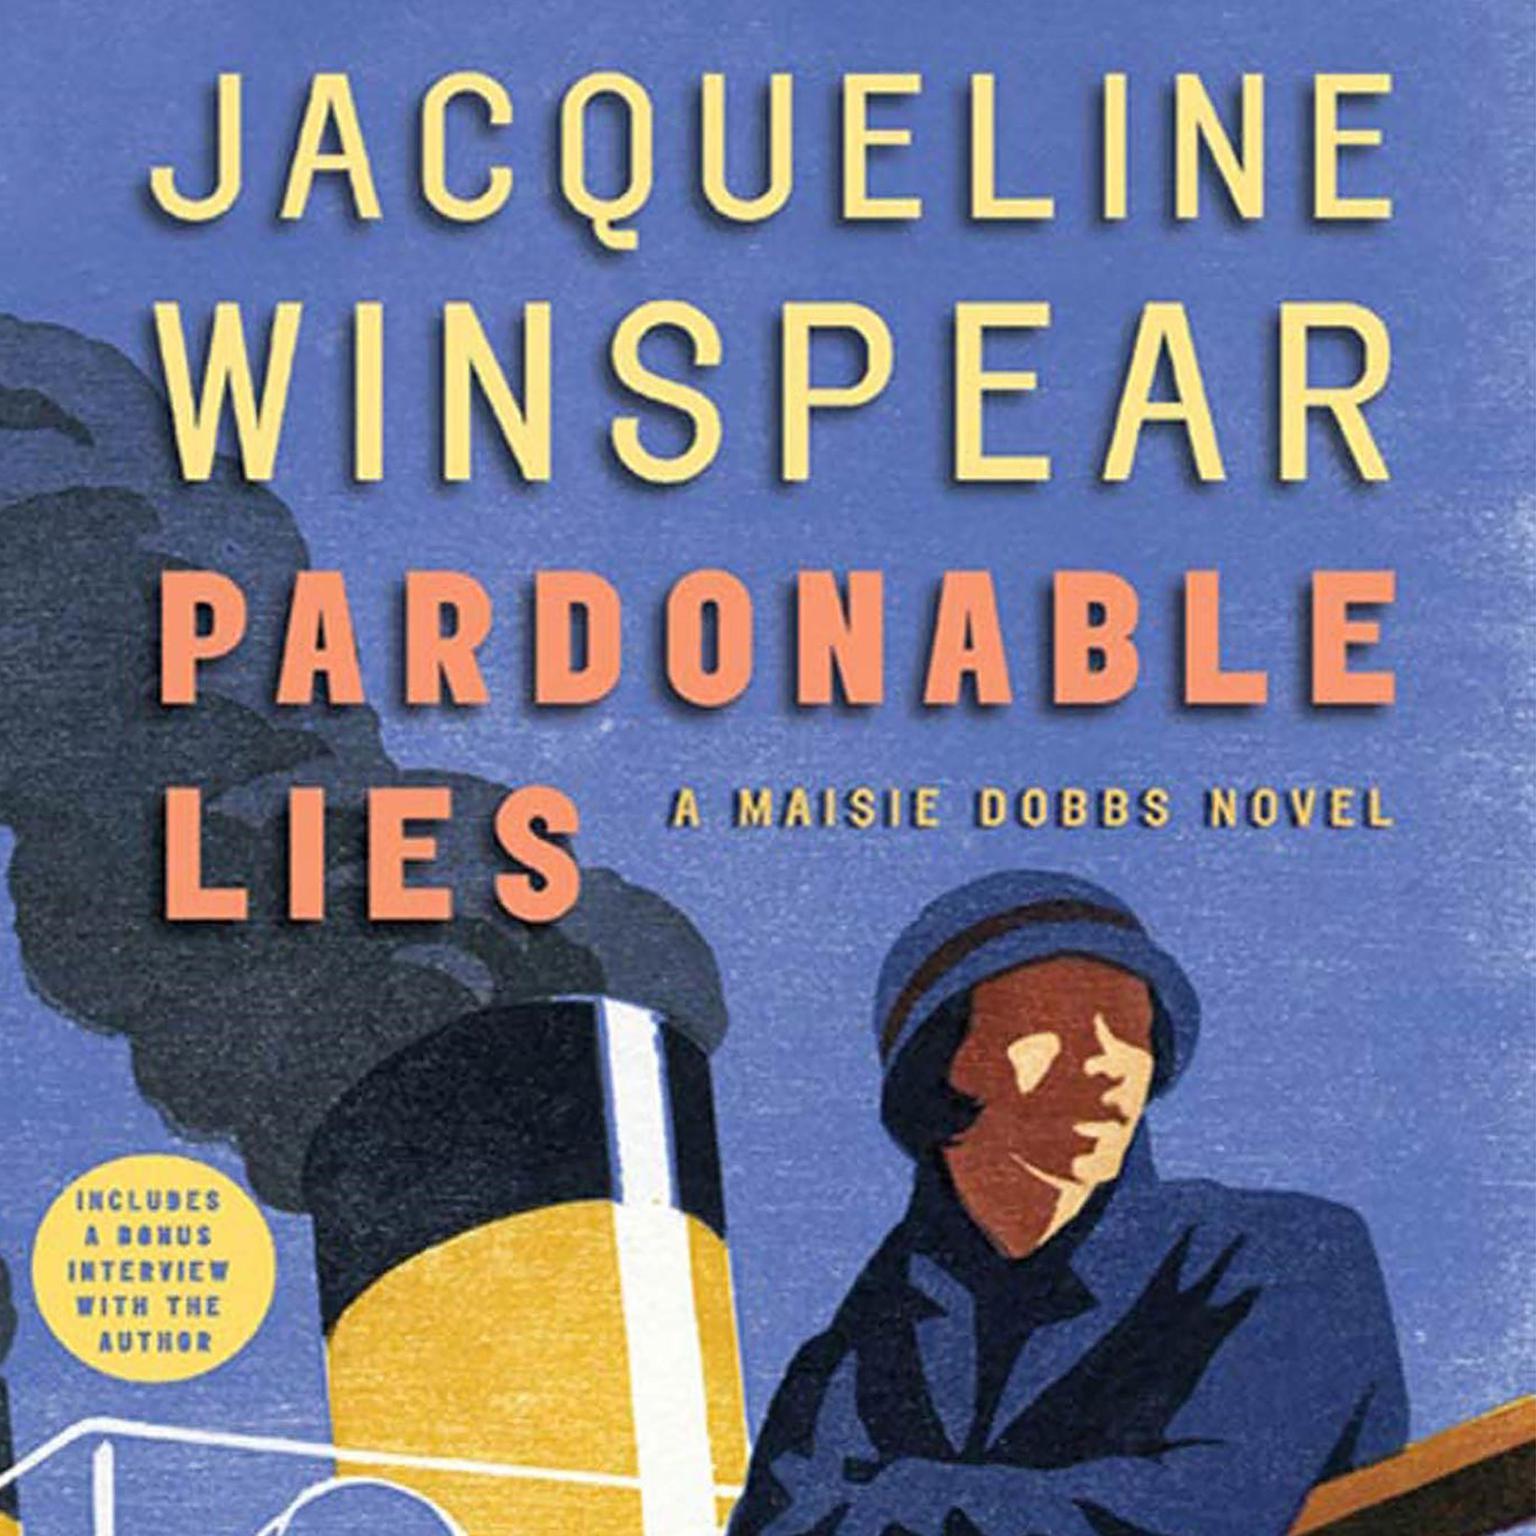 Printable Pardonable Lies: A Maisie Dobbs Novel Audiobook Cover Art